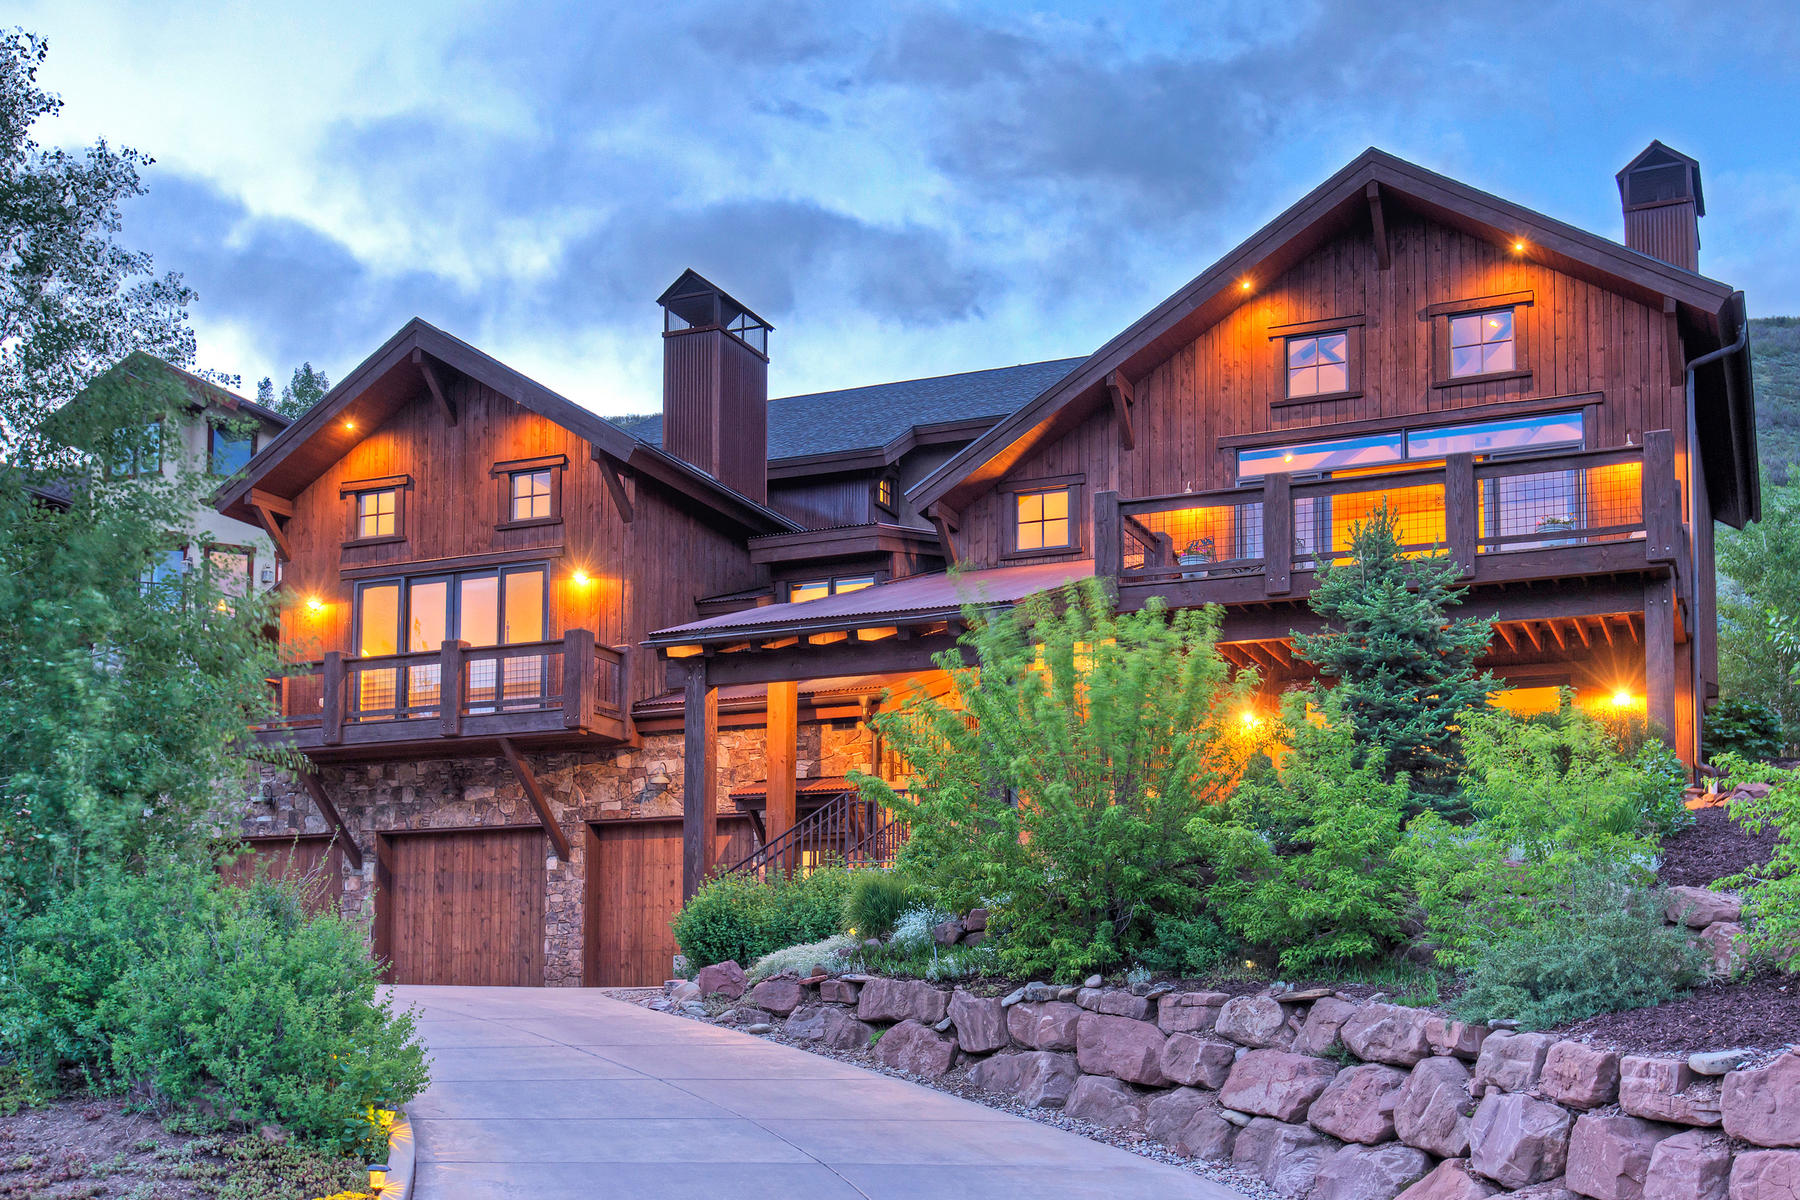 独户住宅 为 销售 在 Mountain Contemporary in Magical Setting with Views 2938 Daybreaker Dr 帕克城, 犹他州, 84098 美国